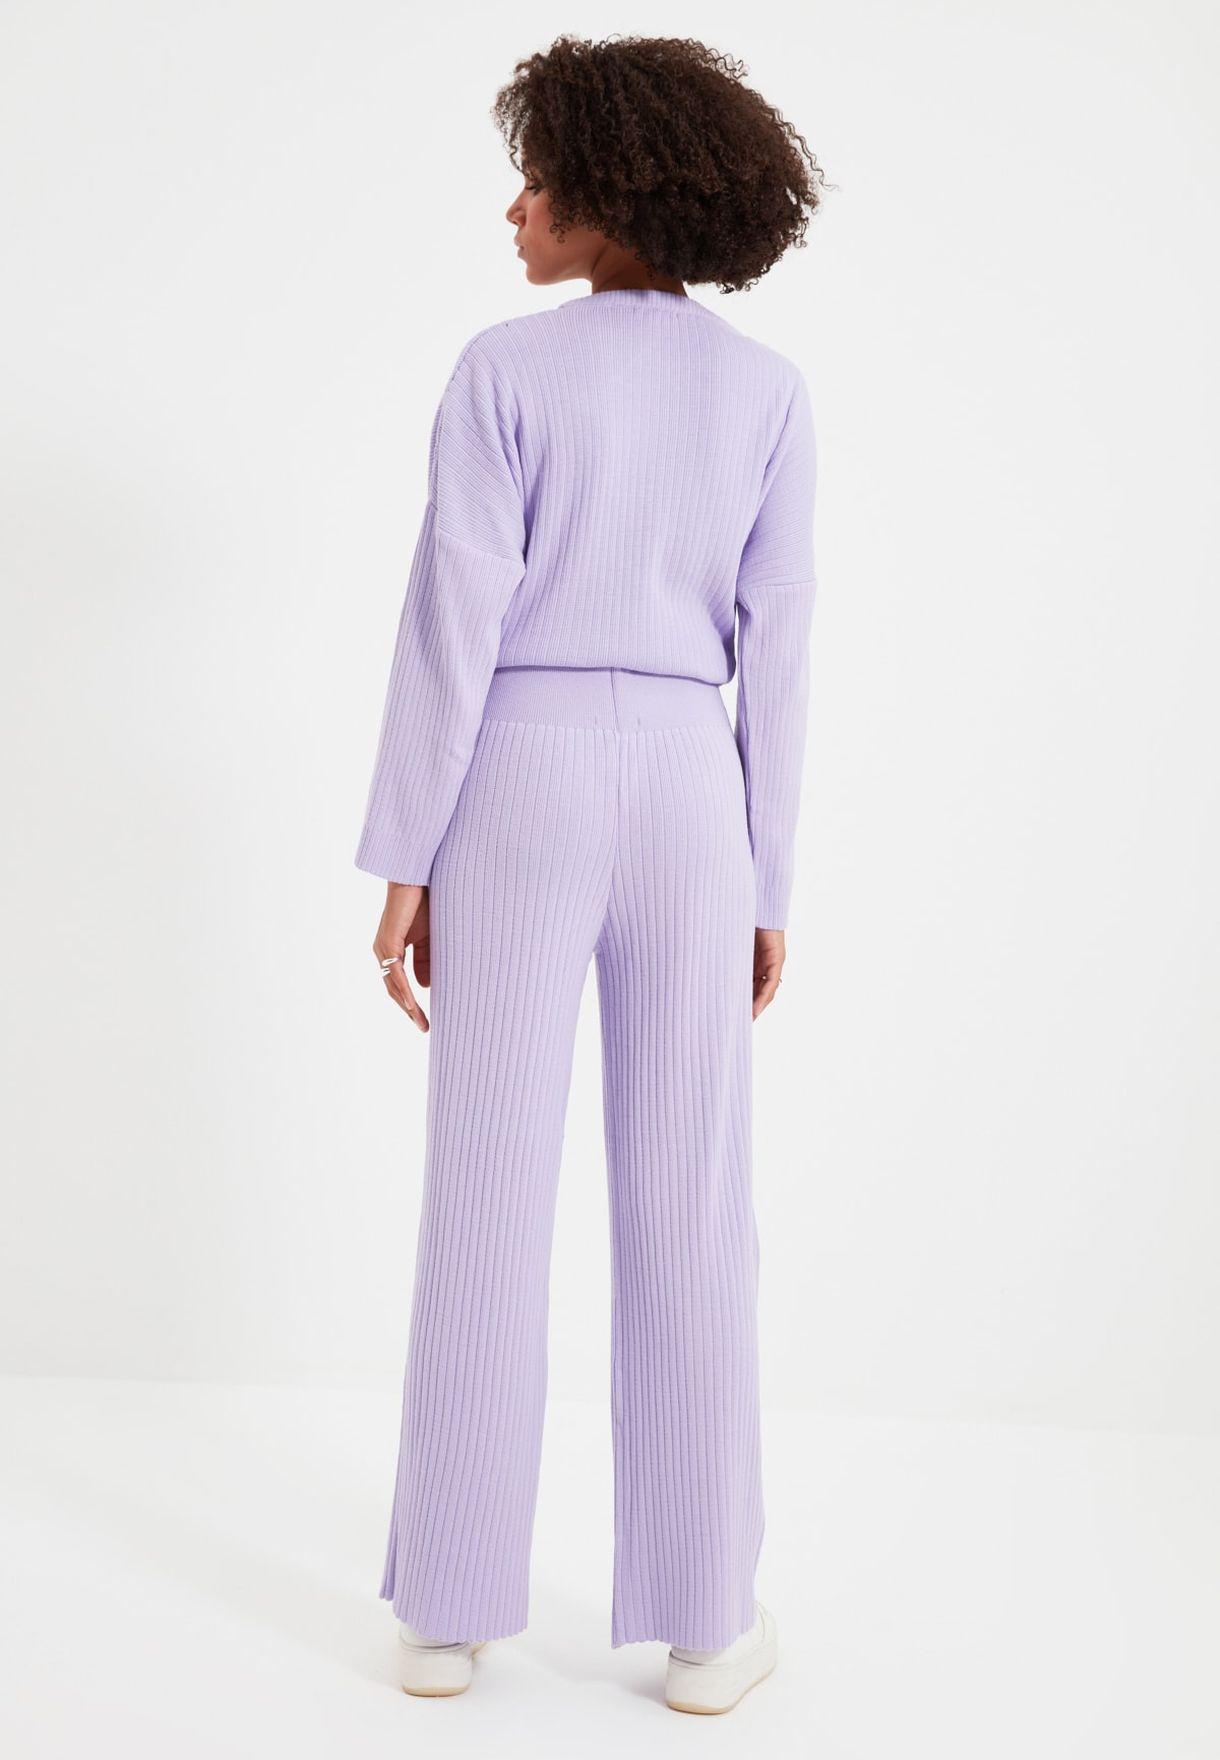 Ribbed Top & Wide Leg Pants Set